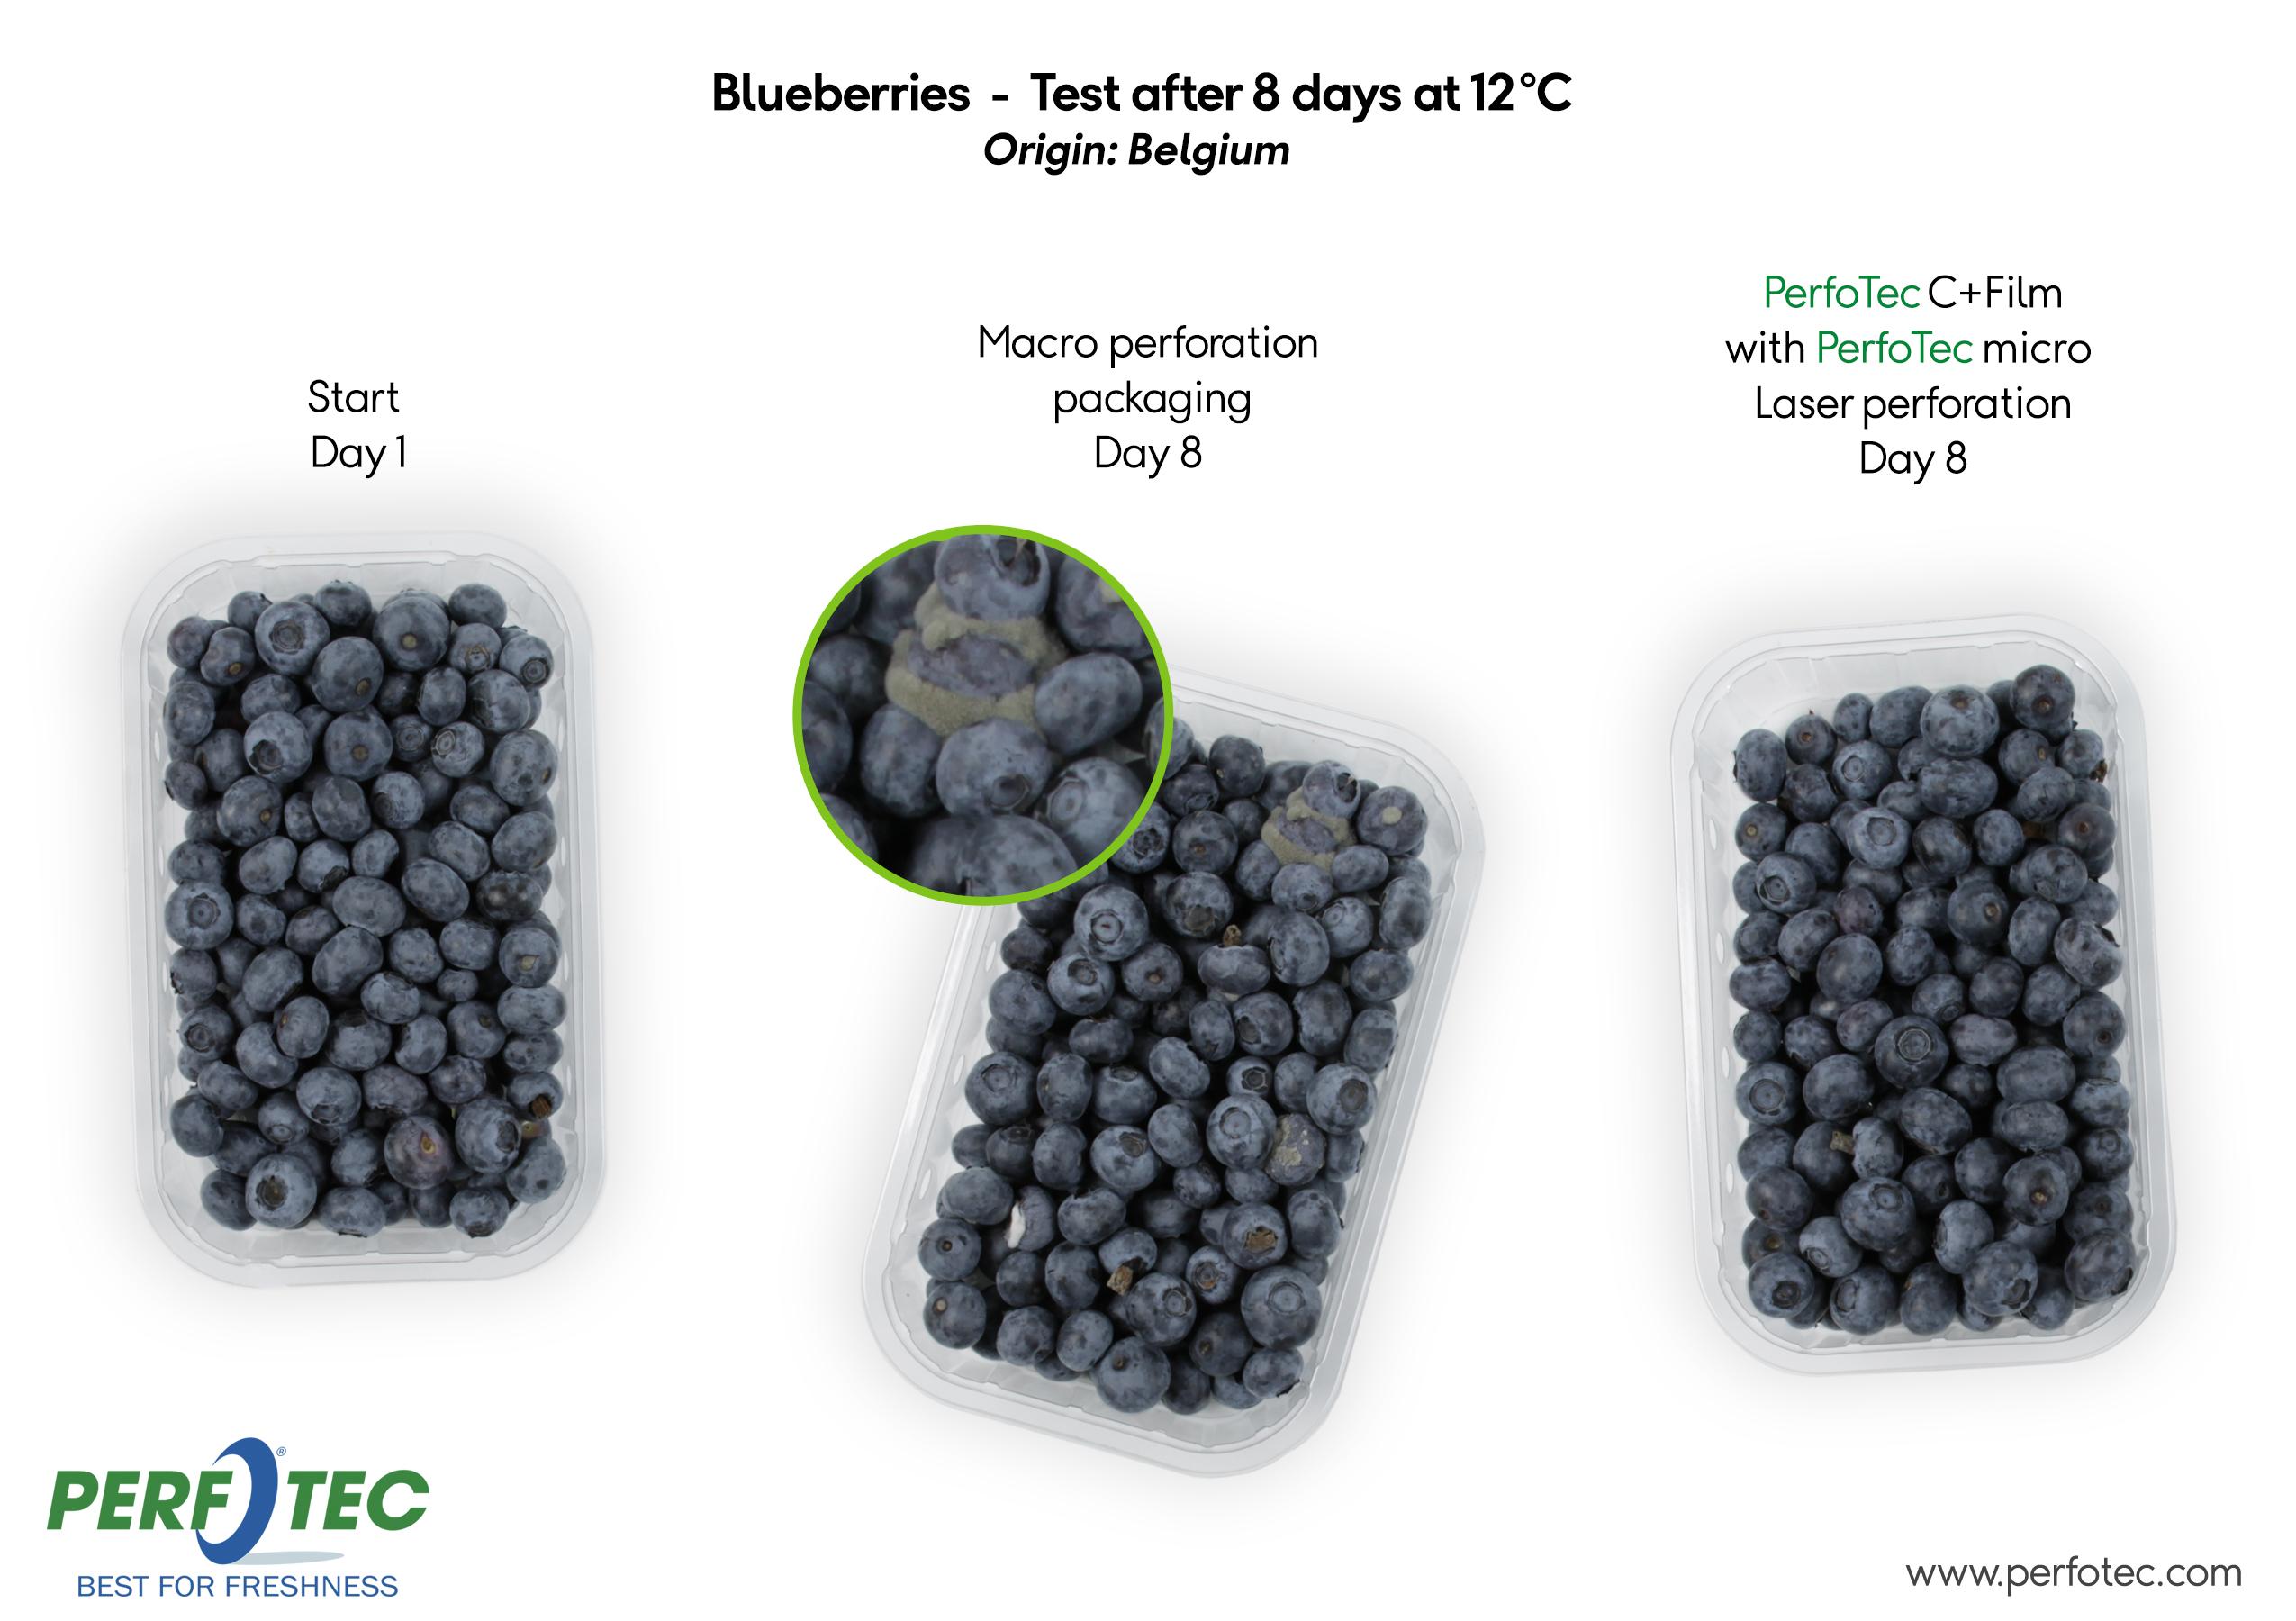 PerfoTec C+ Film trial with Blueberries